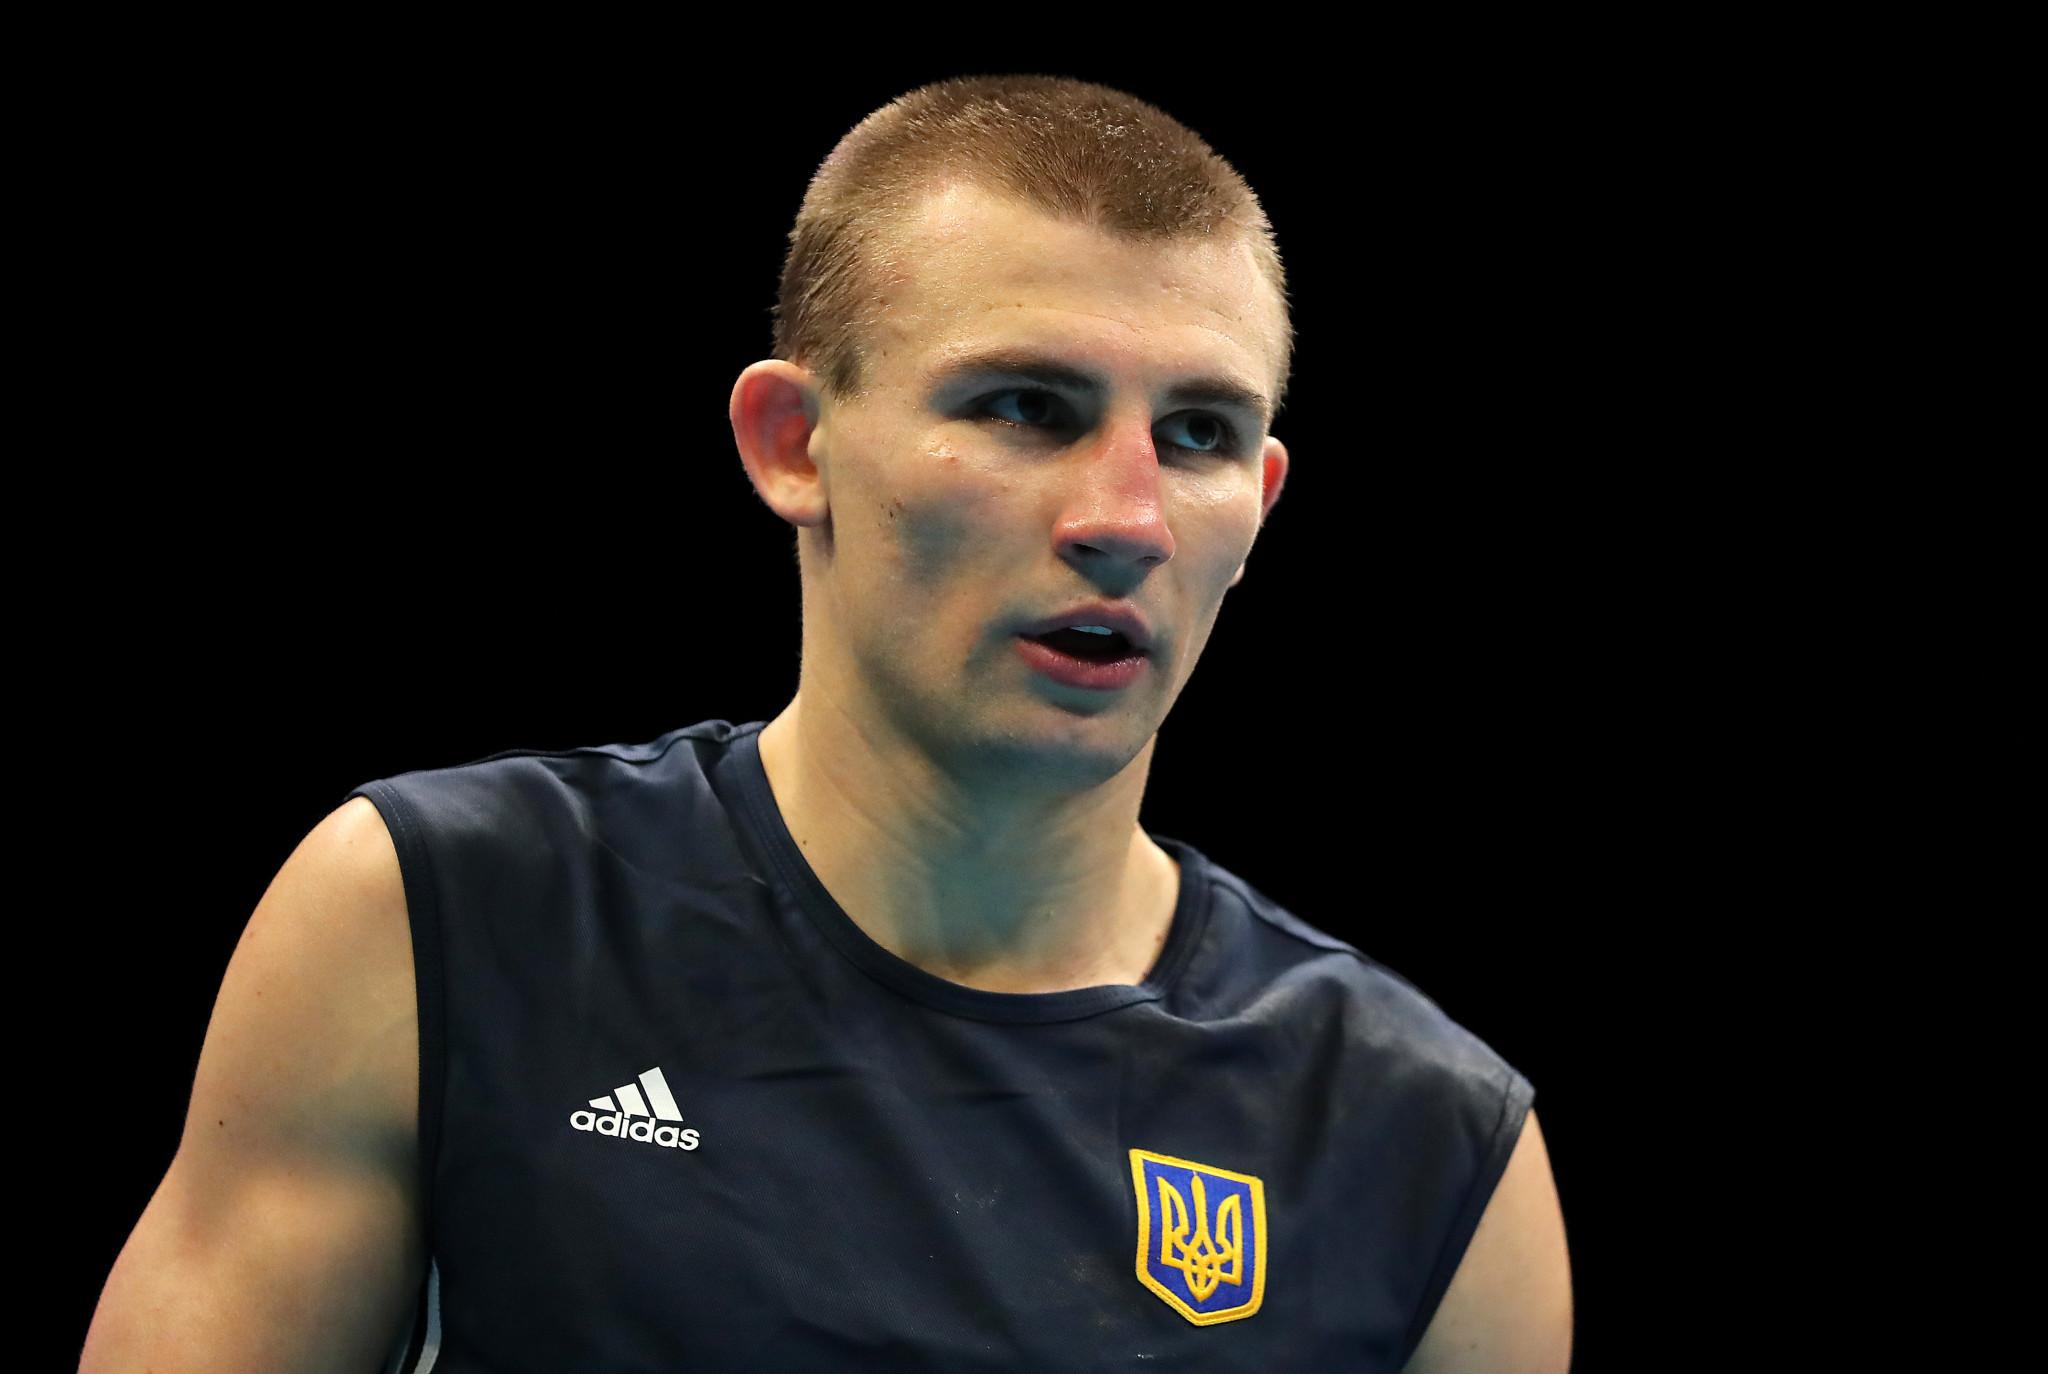 European champion Khyzhniak elected as AIBA Athletes' Commission chairman